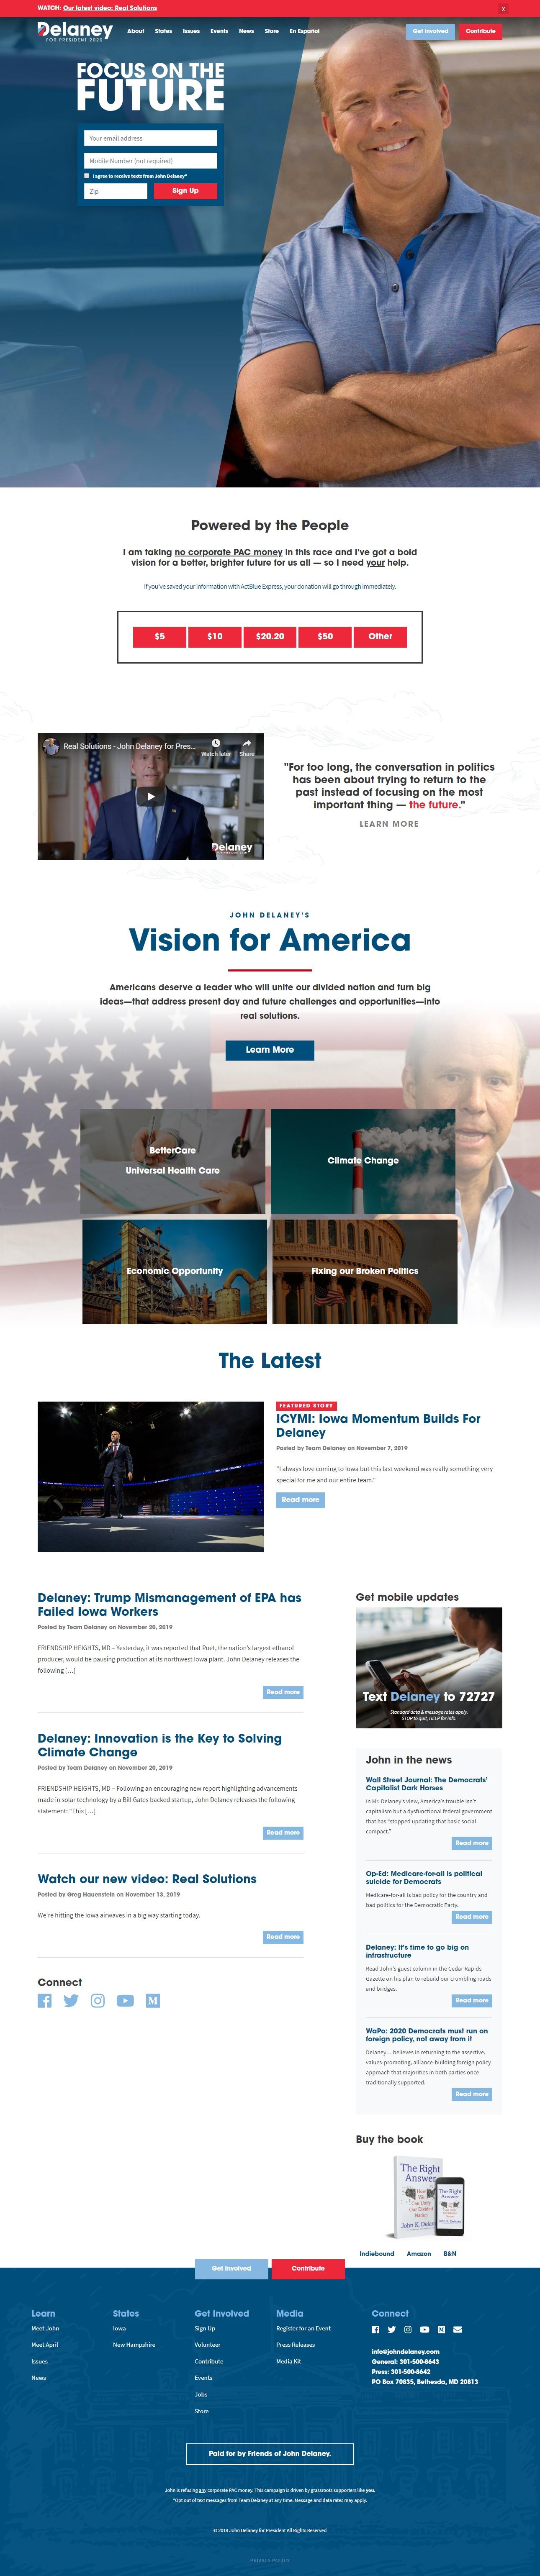 Homepage Snapshot for December 1, 2019: Former Representative John Delaney